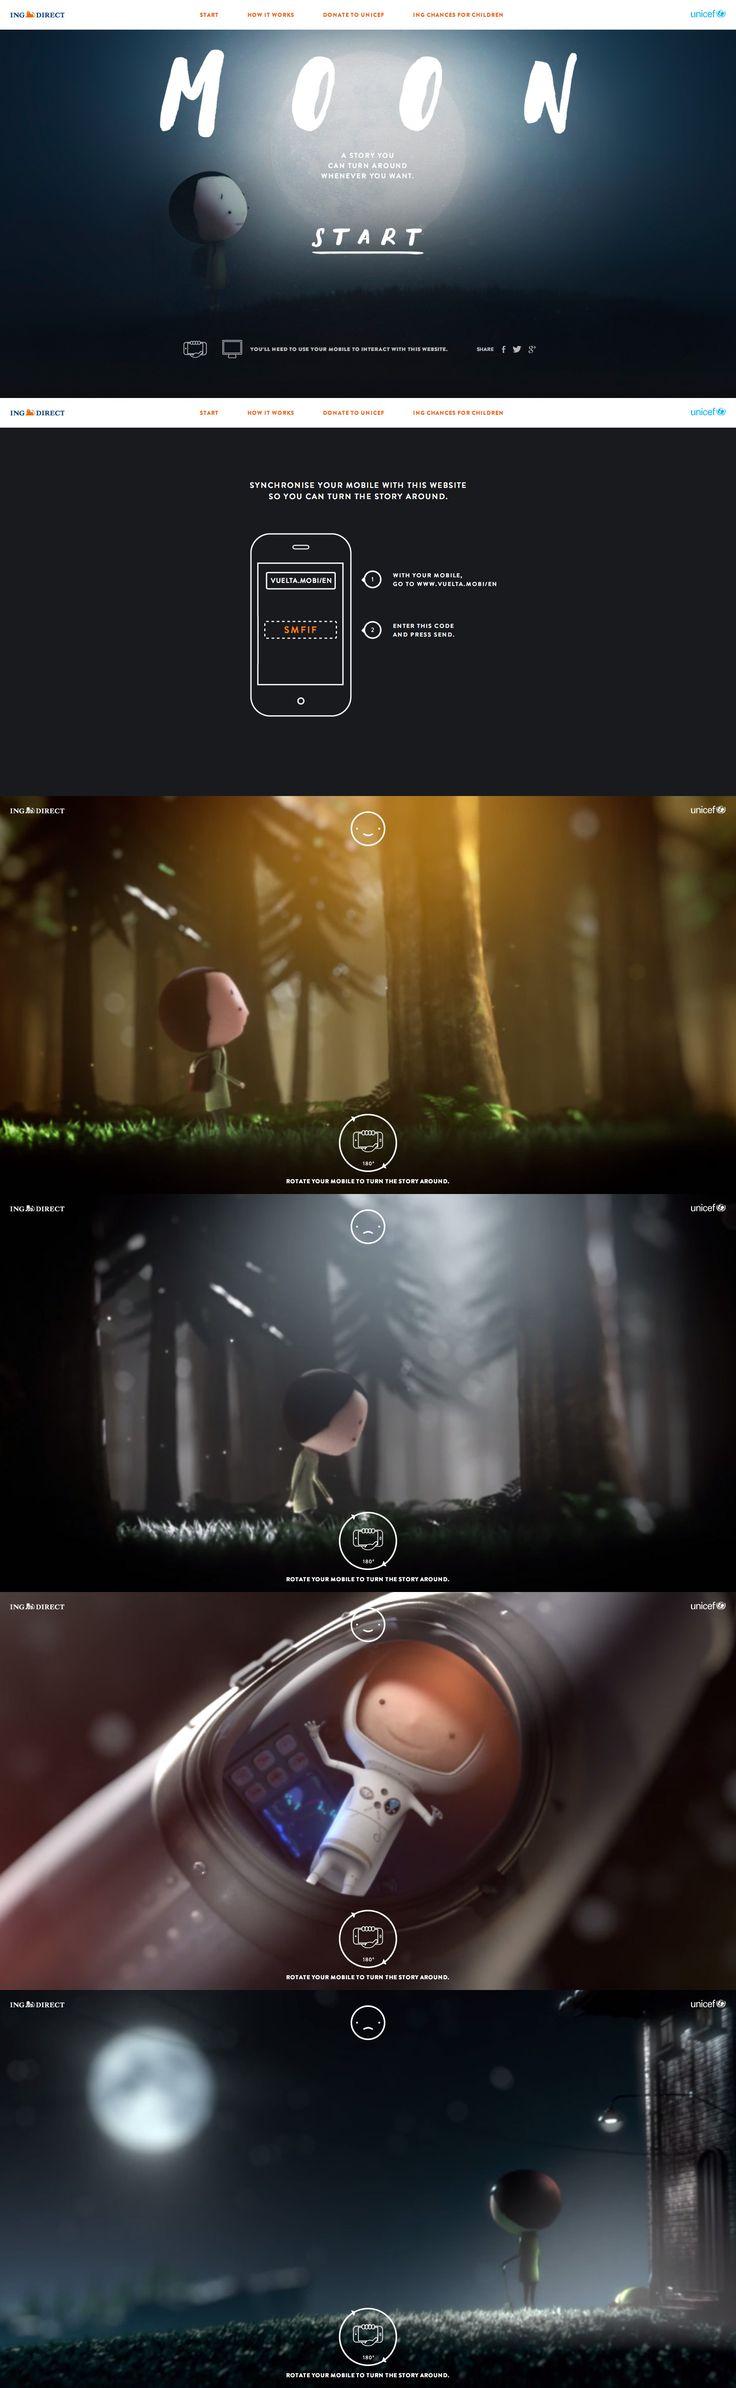 MOON \\ Cool mobile/desktop sync interactive video for UNICEF. http://unahistoriaquedalavuelta.com/en/